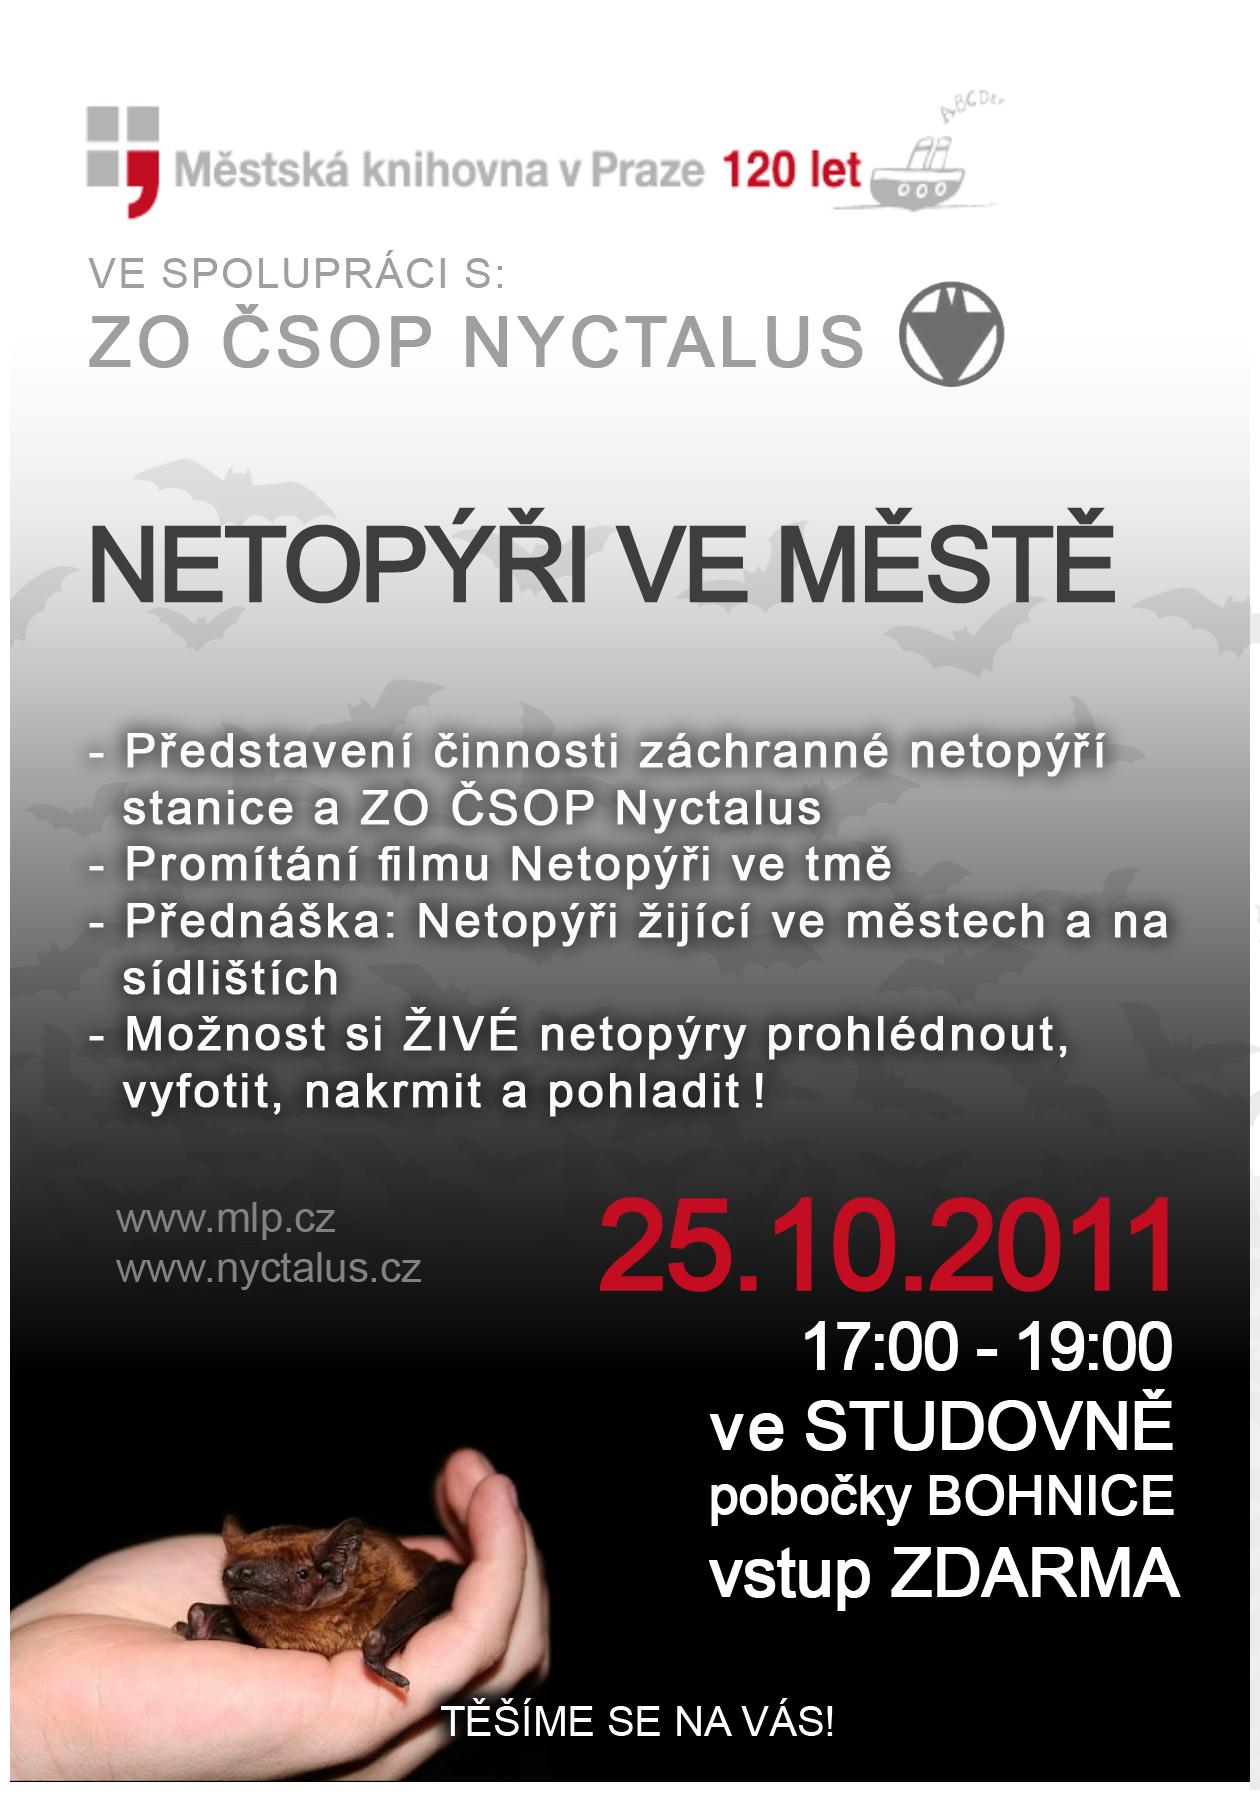 NETOPI_VE_MST